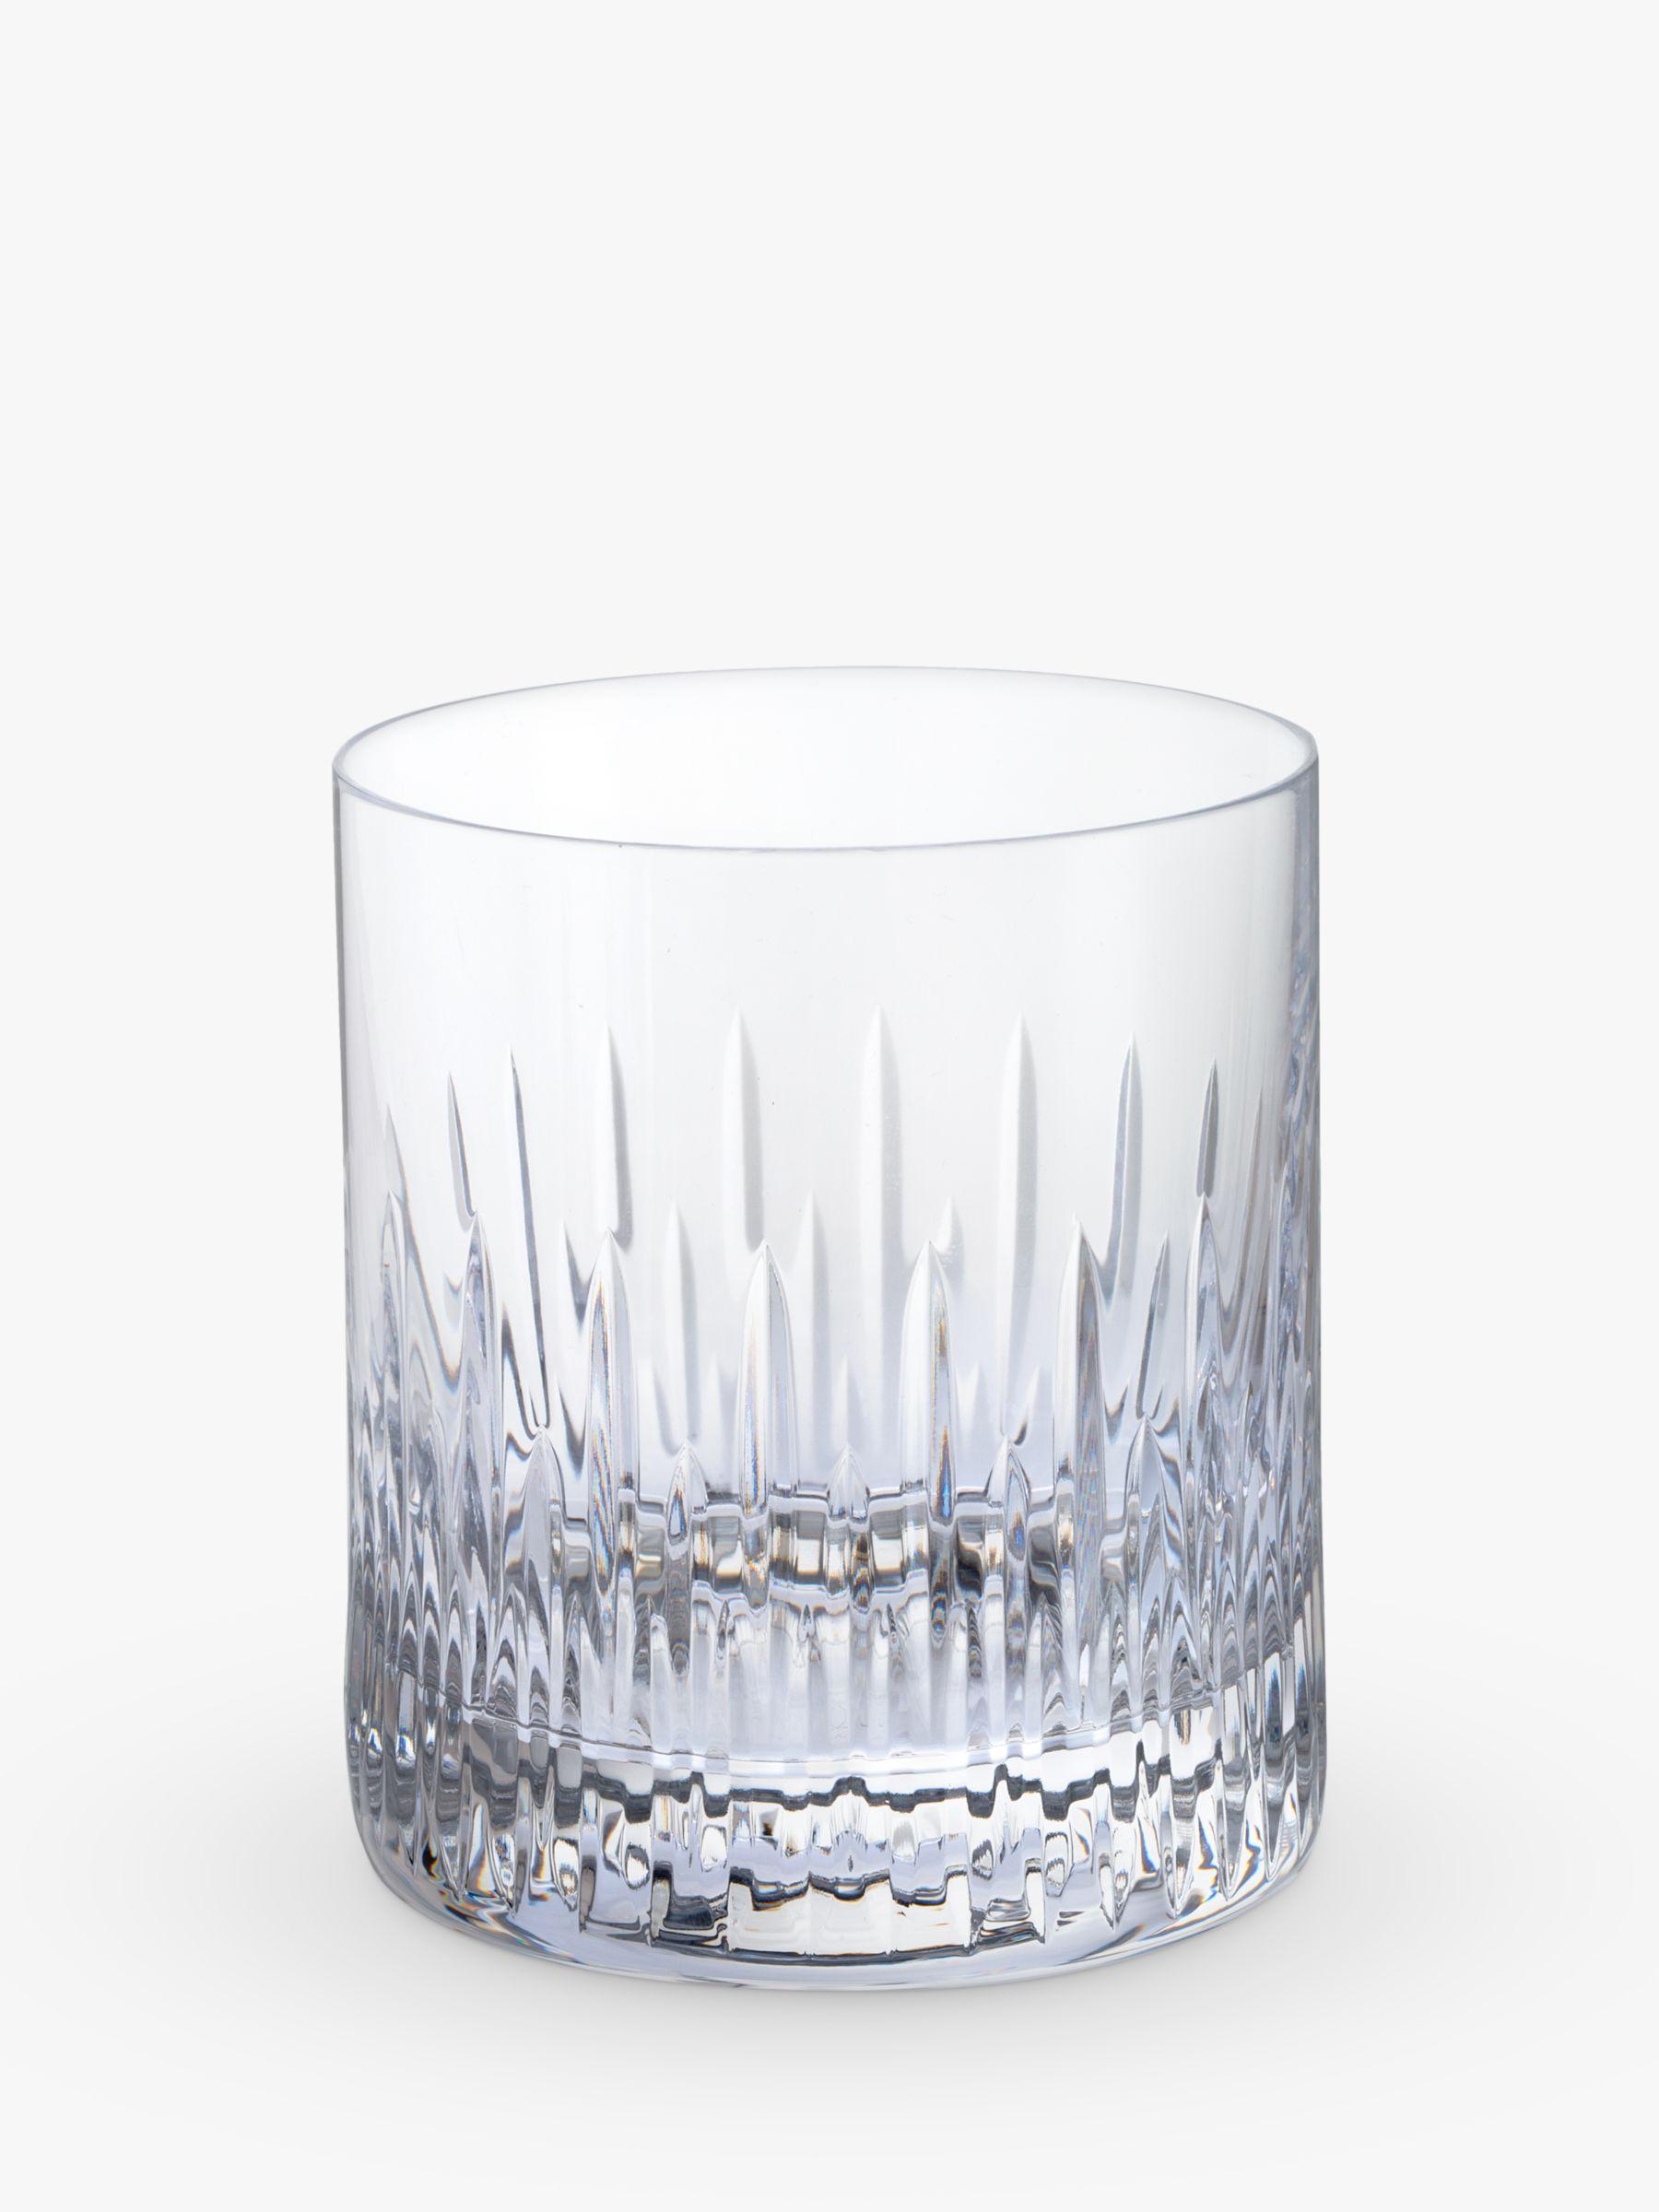 Dartington Crystal Dartington Crystal Limelight Cut Glass Tumblers, Set of 2, 380ml, Clear